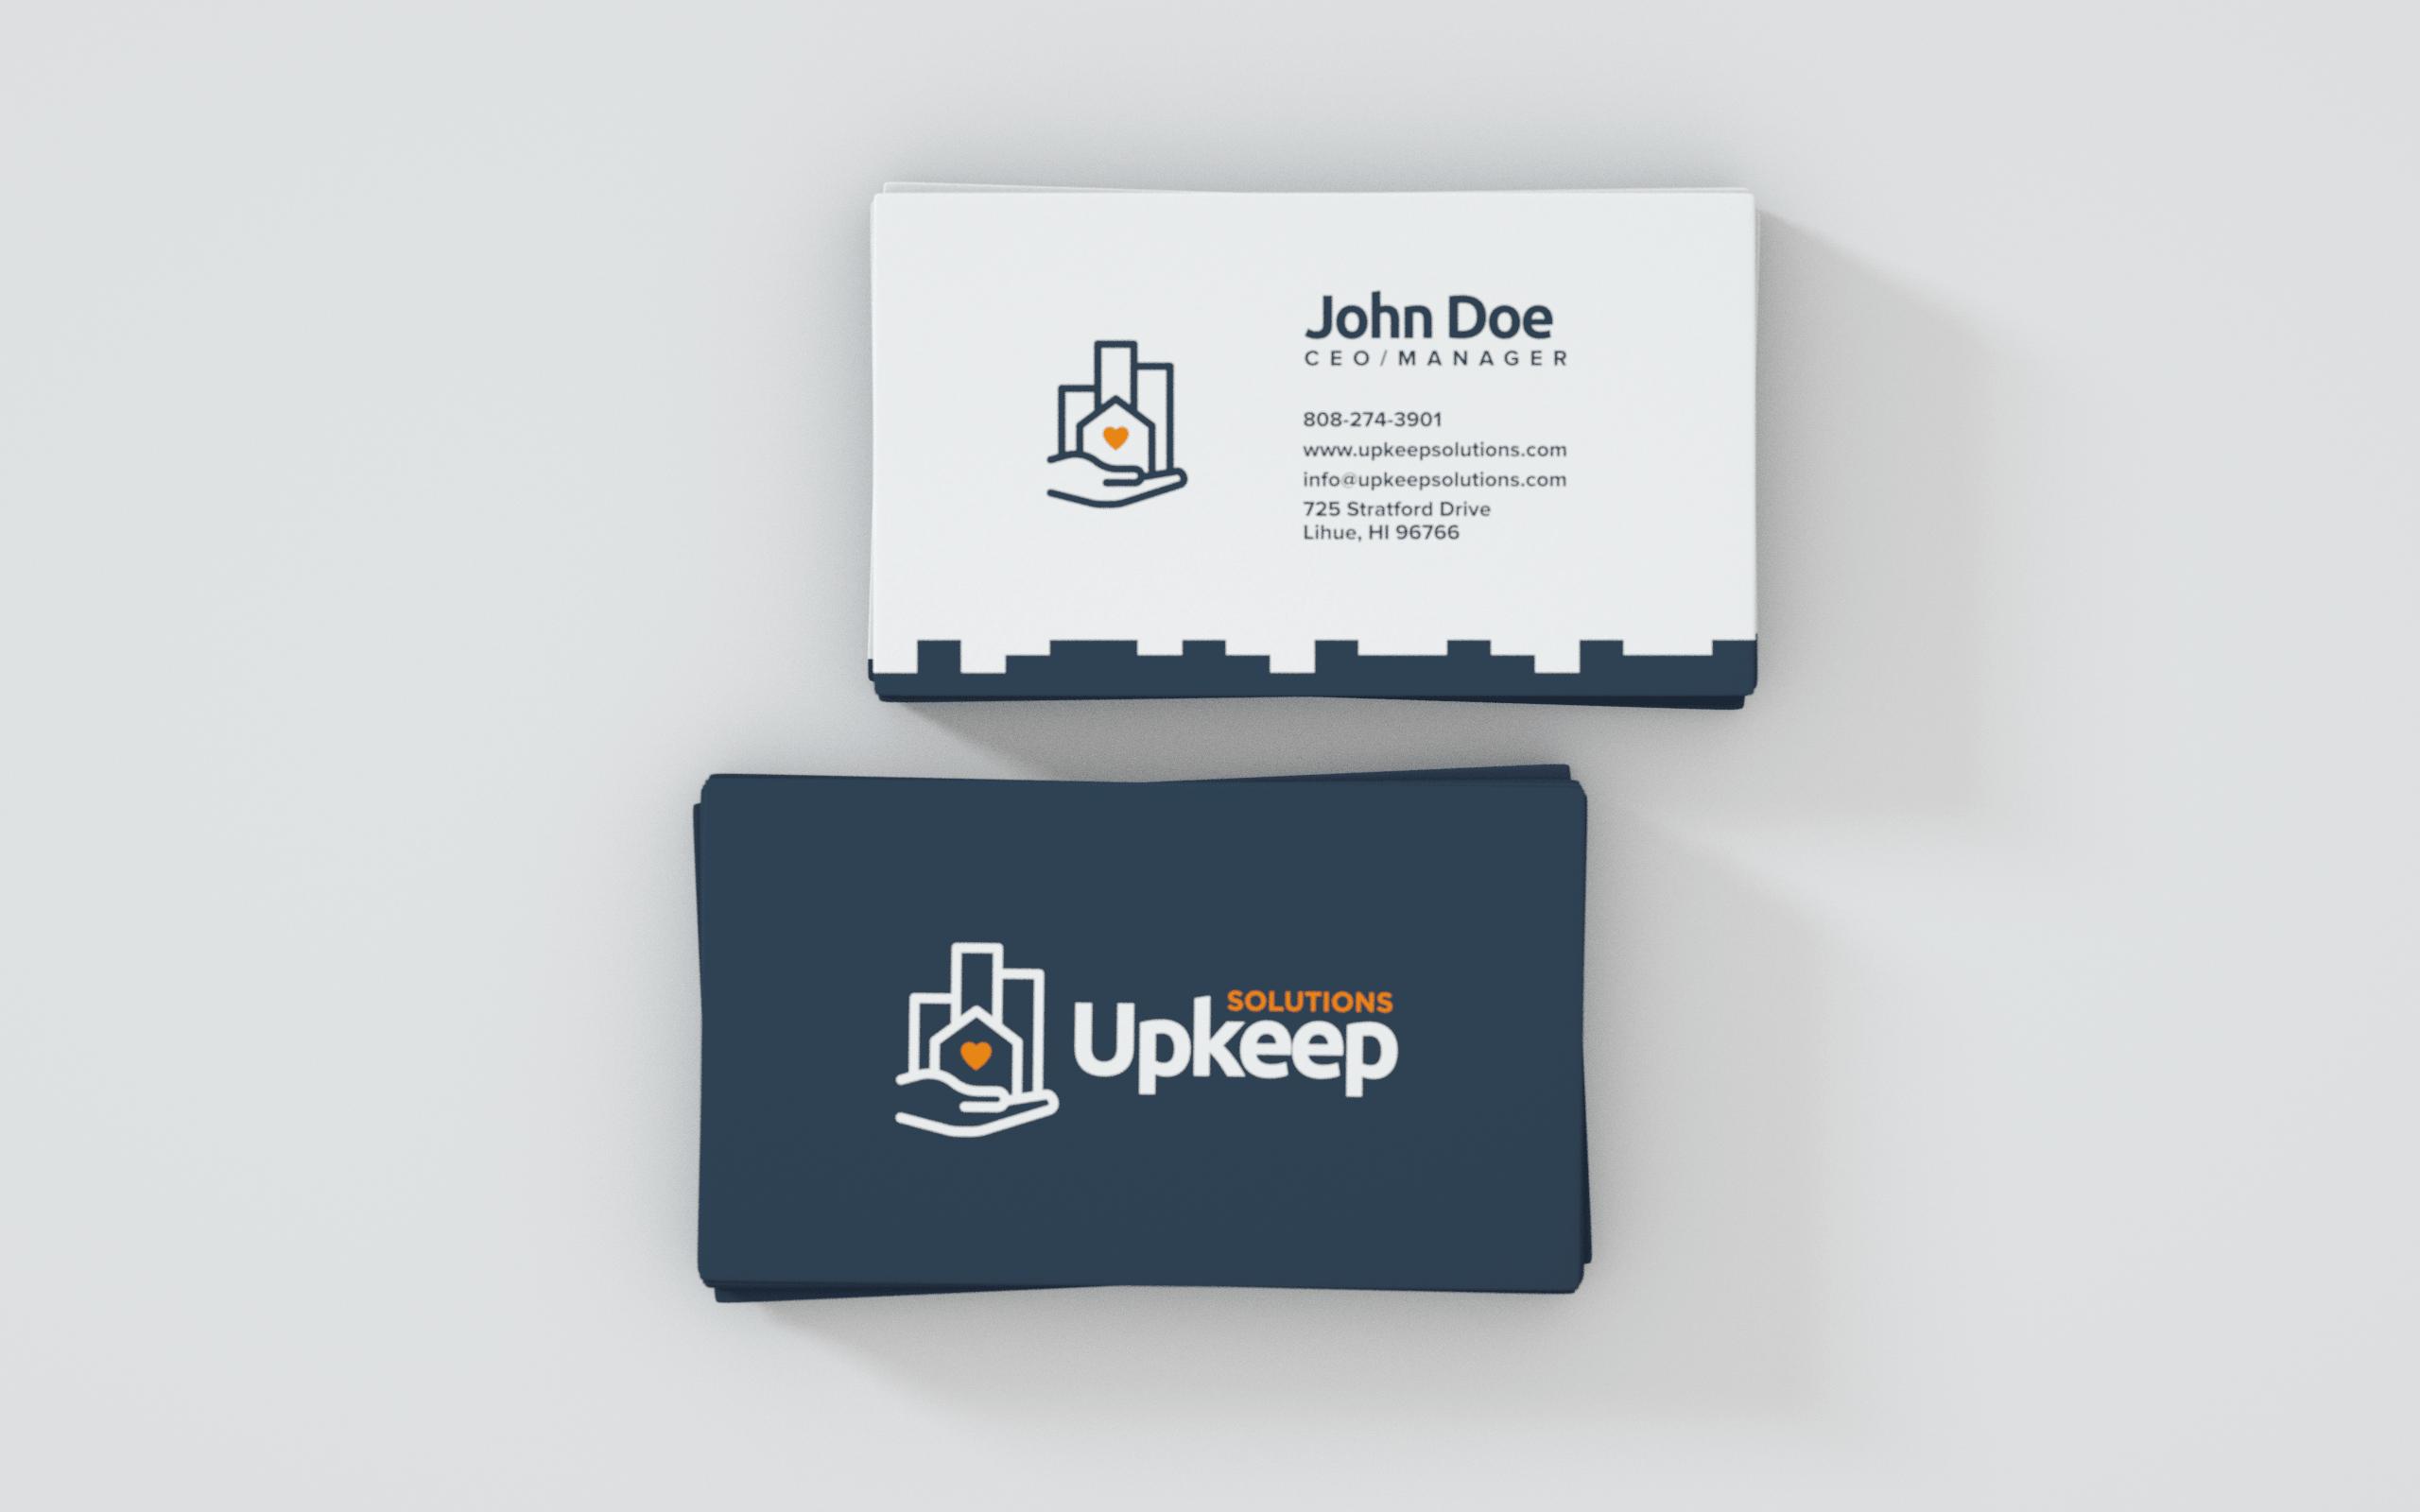 PORTFOLIO, Graphic Design, Website Design, Logo Design, Flyers, Brochures, Ads, Identity Packages, Business Cards